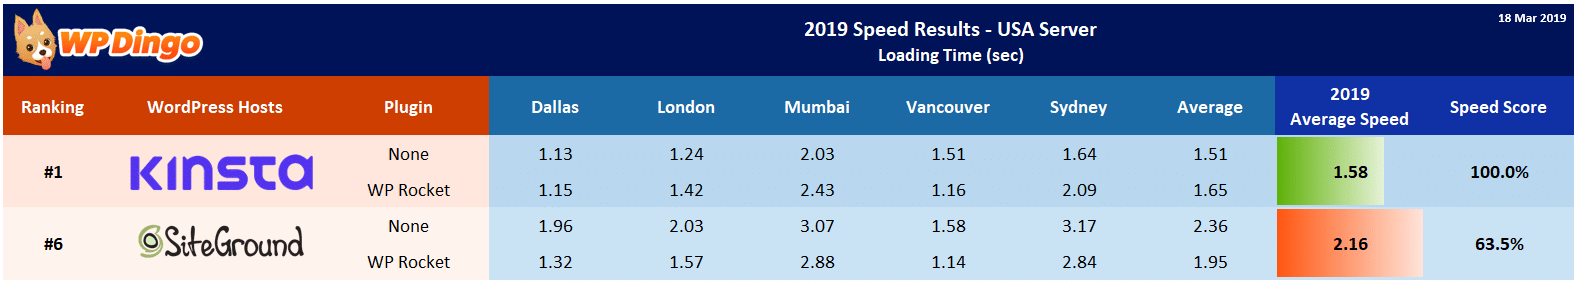 2019 Kinsta vs SiteGround Speed Table - USA Server